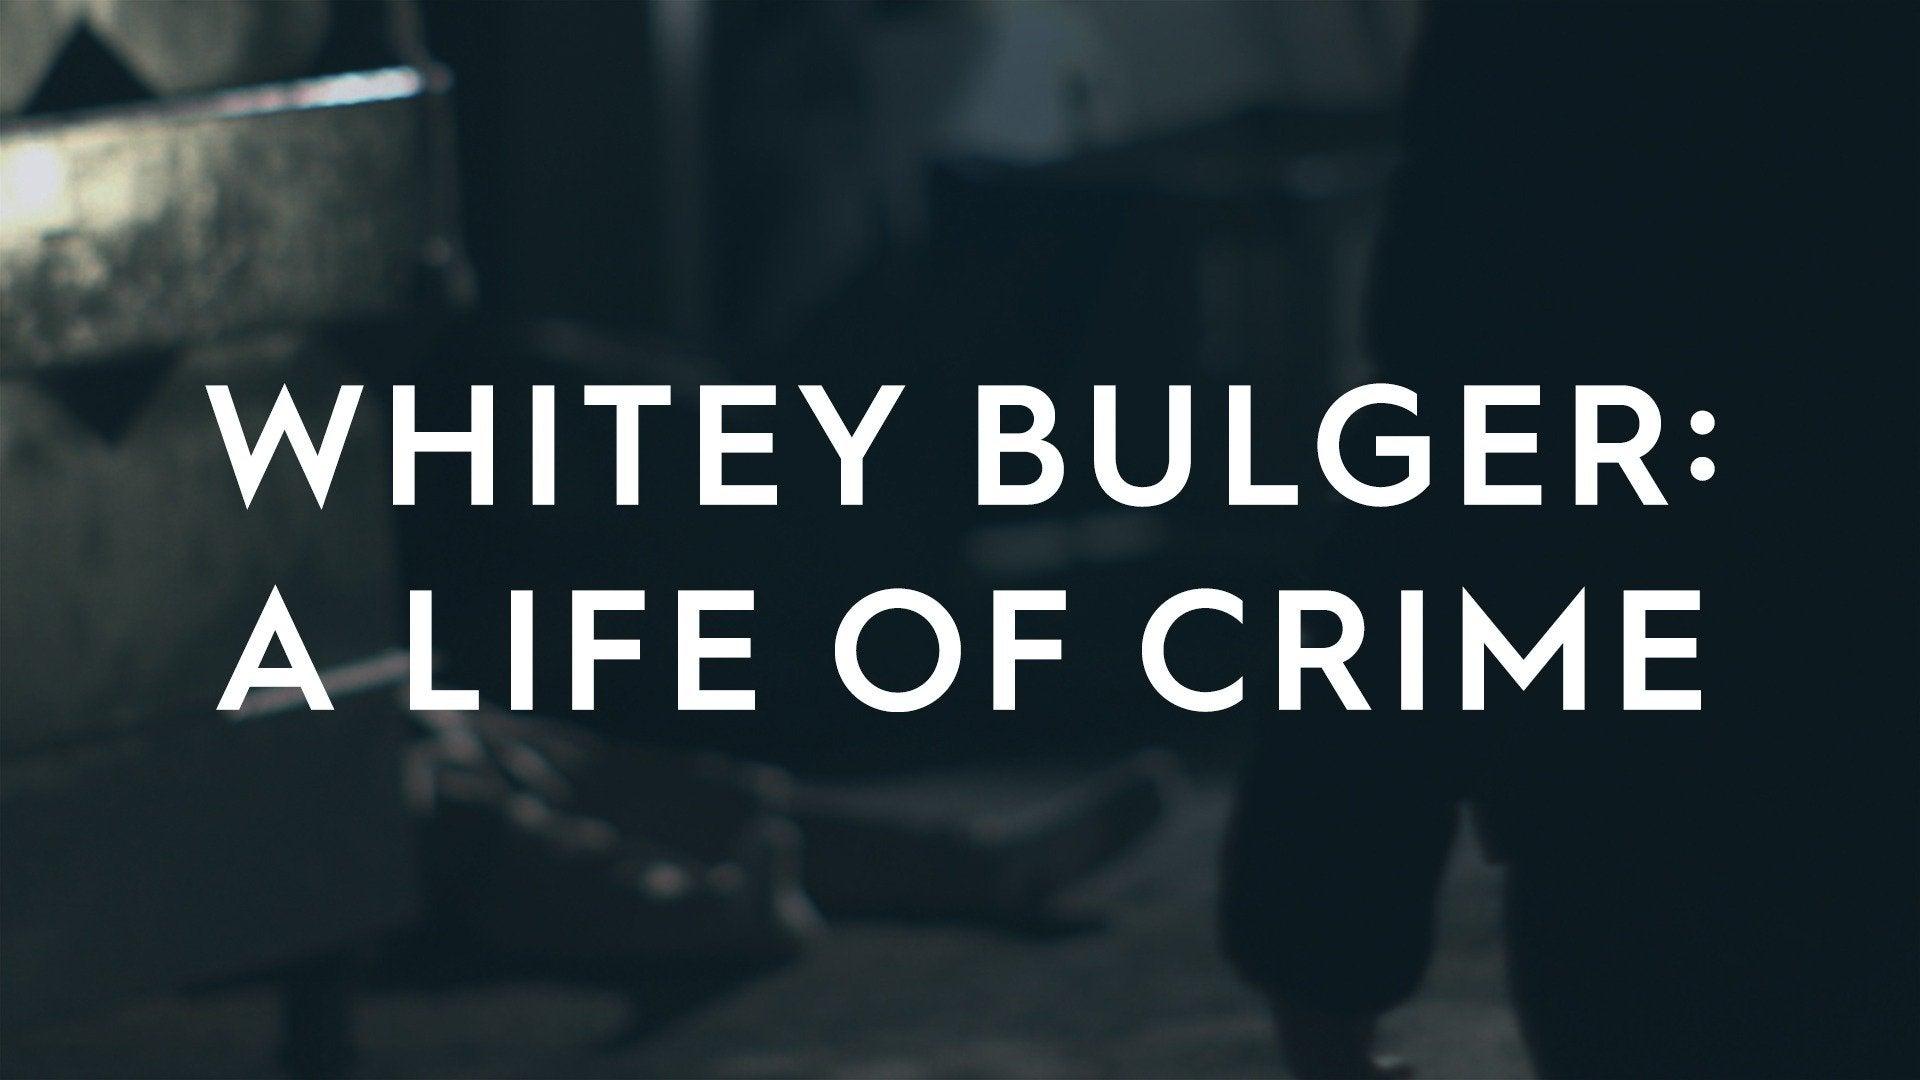 Whitey Bulger: A Life of Crime